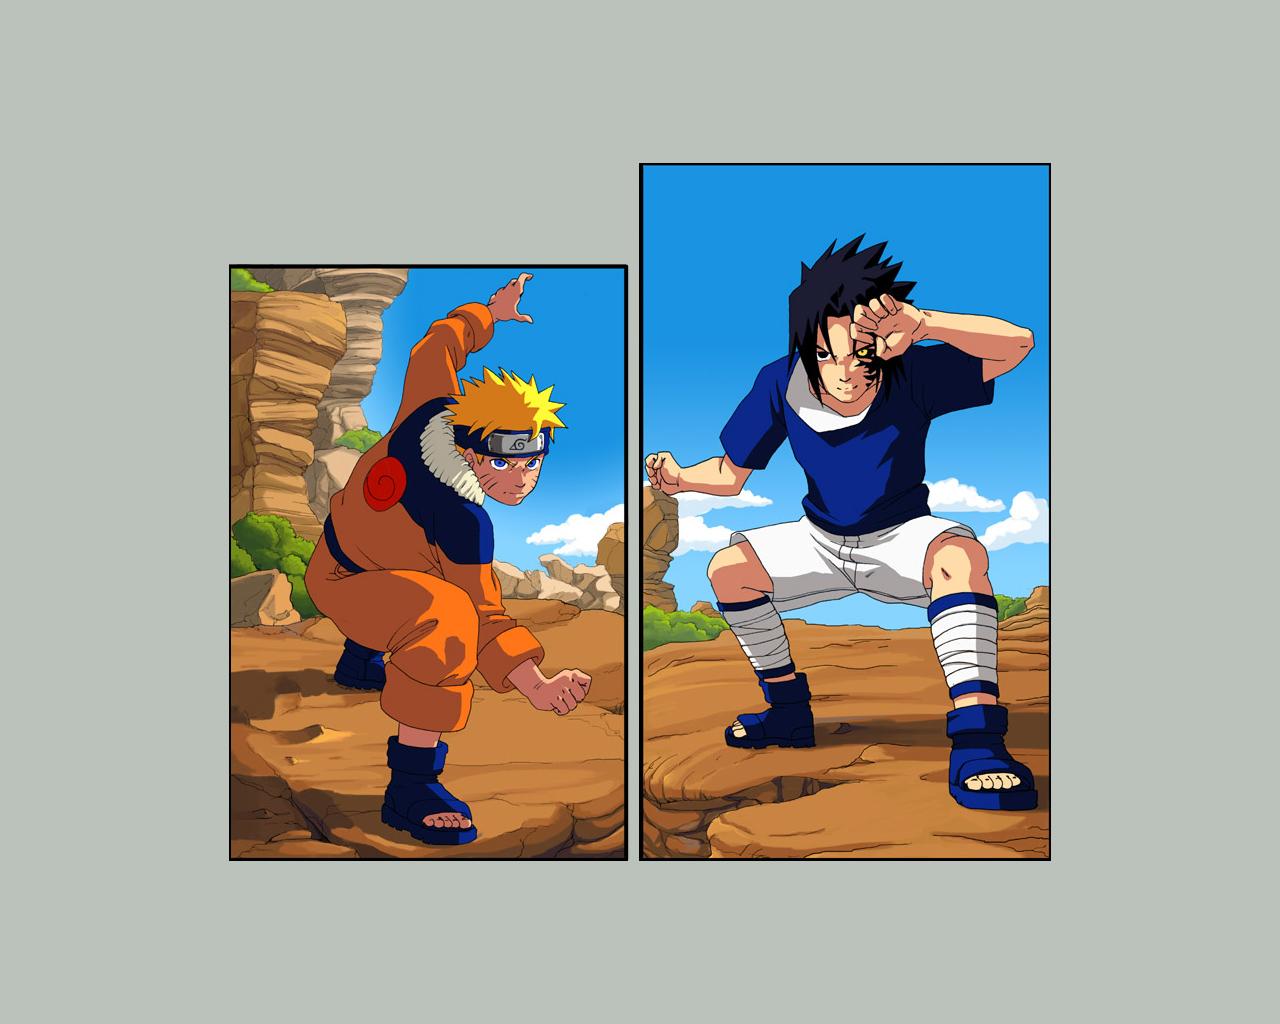 http://4.bp.blogspot.com/-nbqtH4QaZFI/TzioqJRElyI/AAAAAAAAAXg/psDE7ozsX50/s1600/Sasuke_vs_Naruto_Wallpaper-294540.jpeg